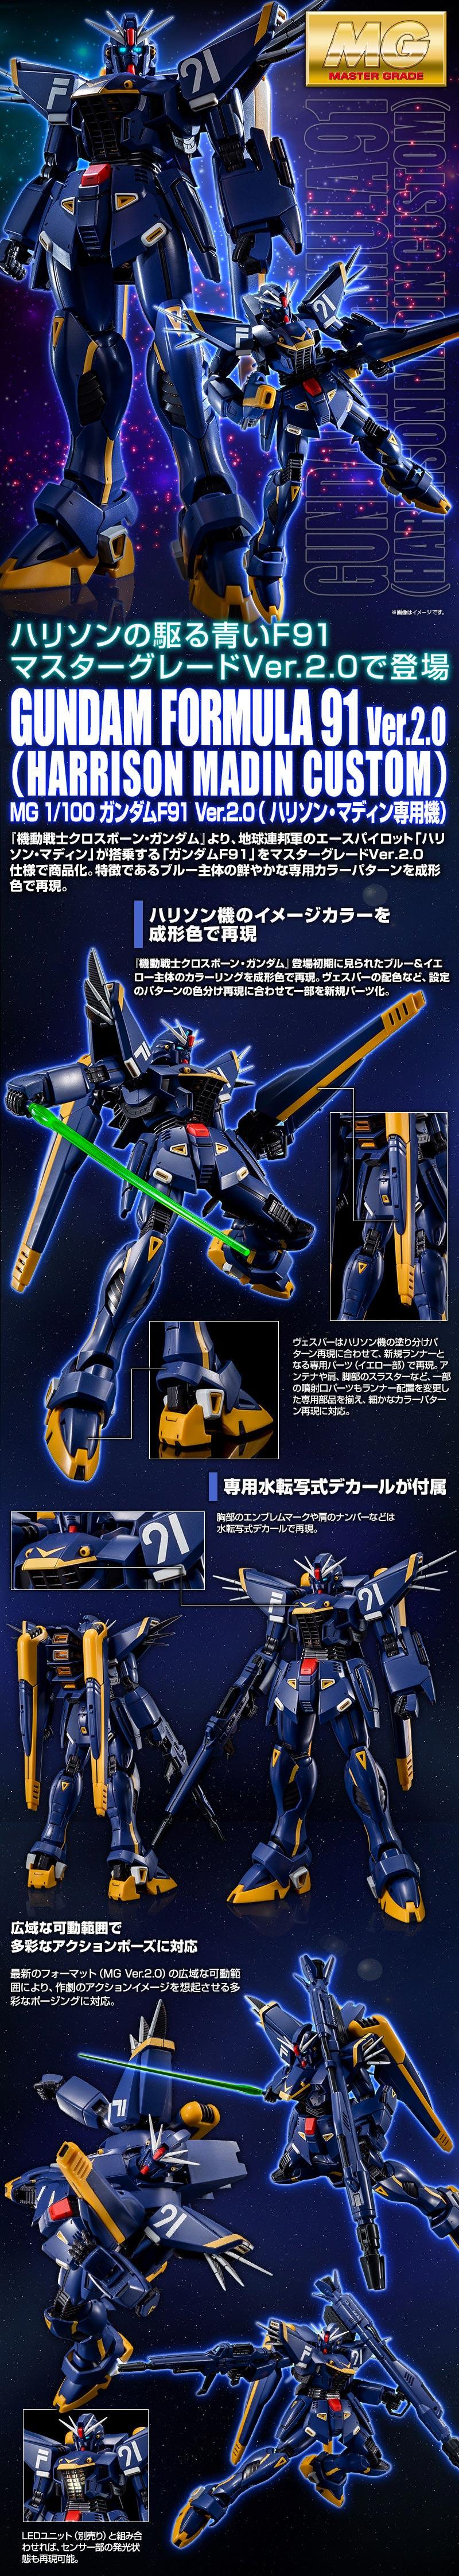 MG F-91 Gundam F91 Ver 2.0 (Harrison Custom) Details